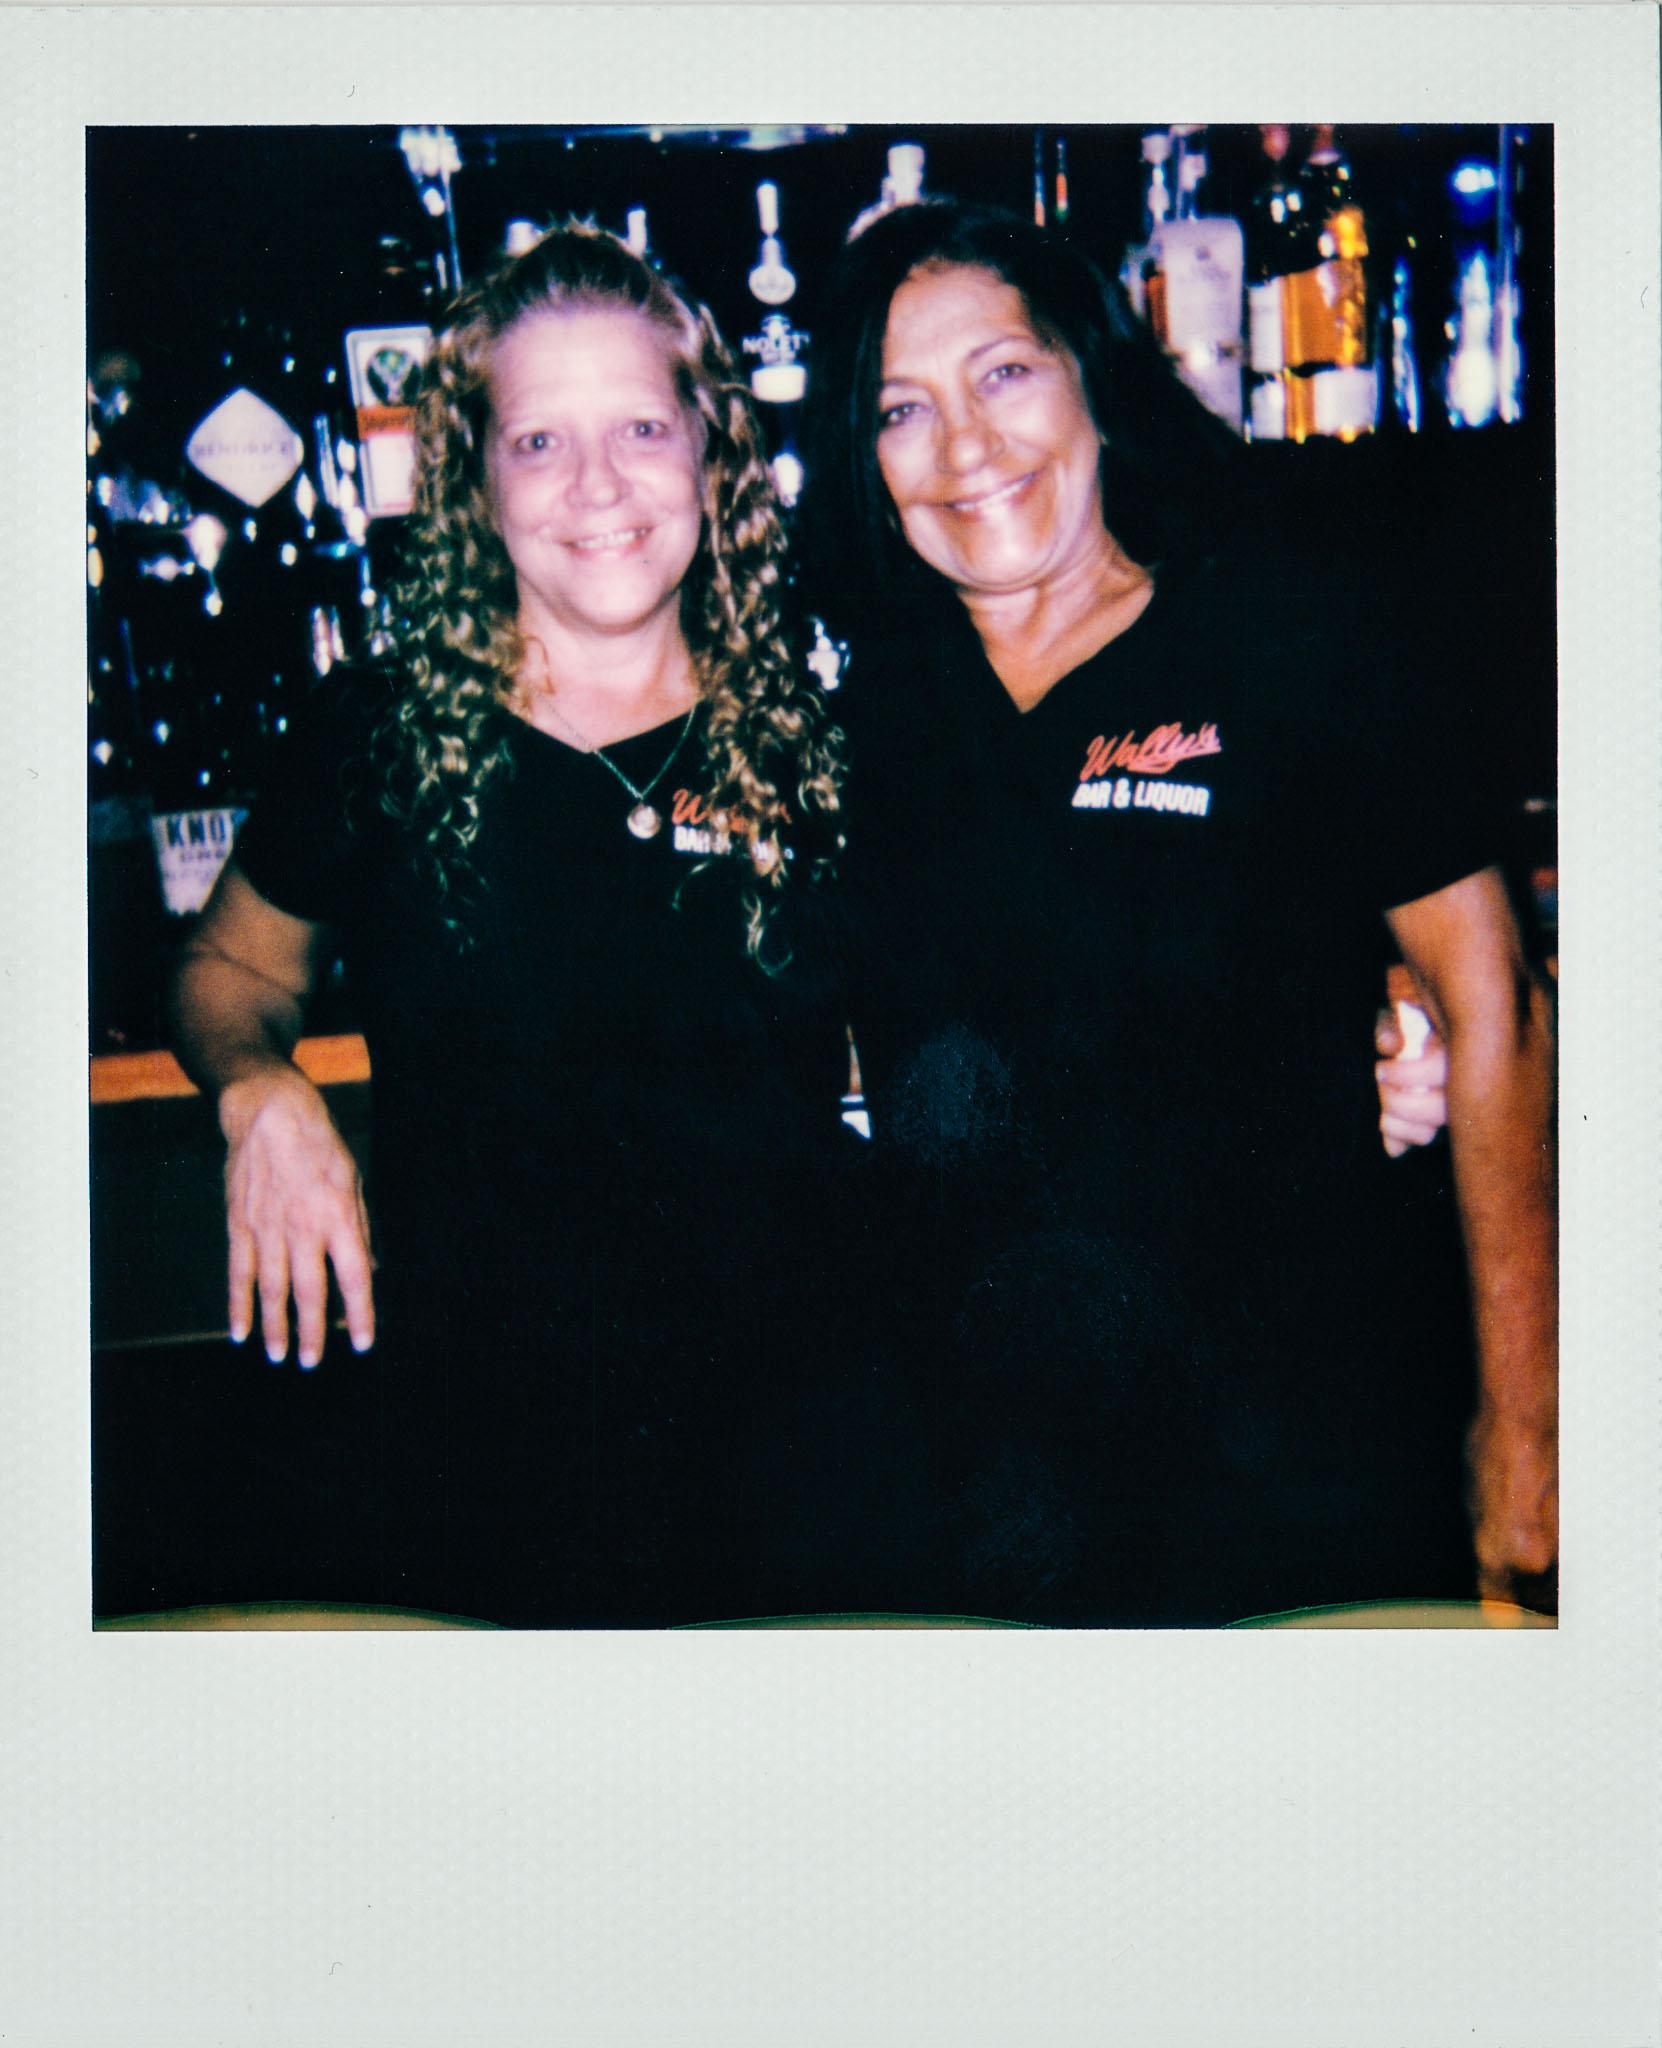 Two female bartenders at Wallys Mills Avenue Liquors